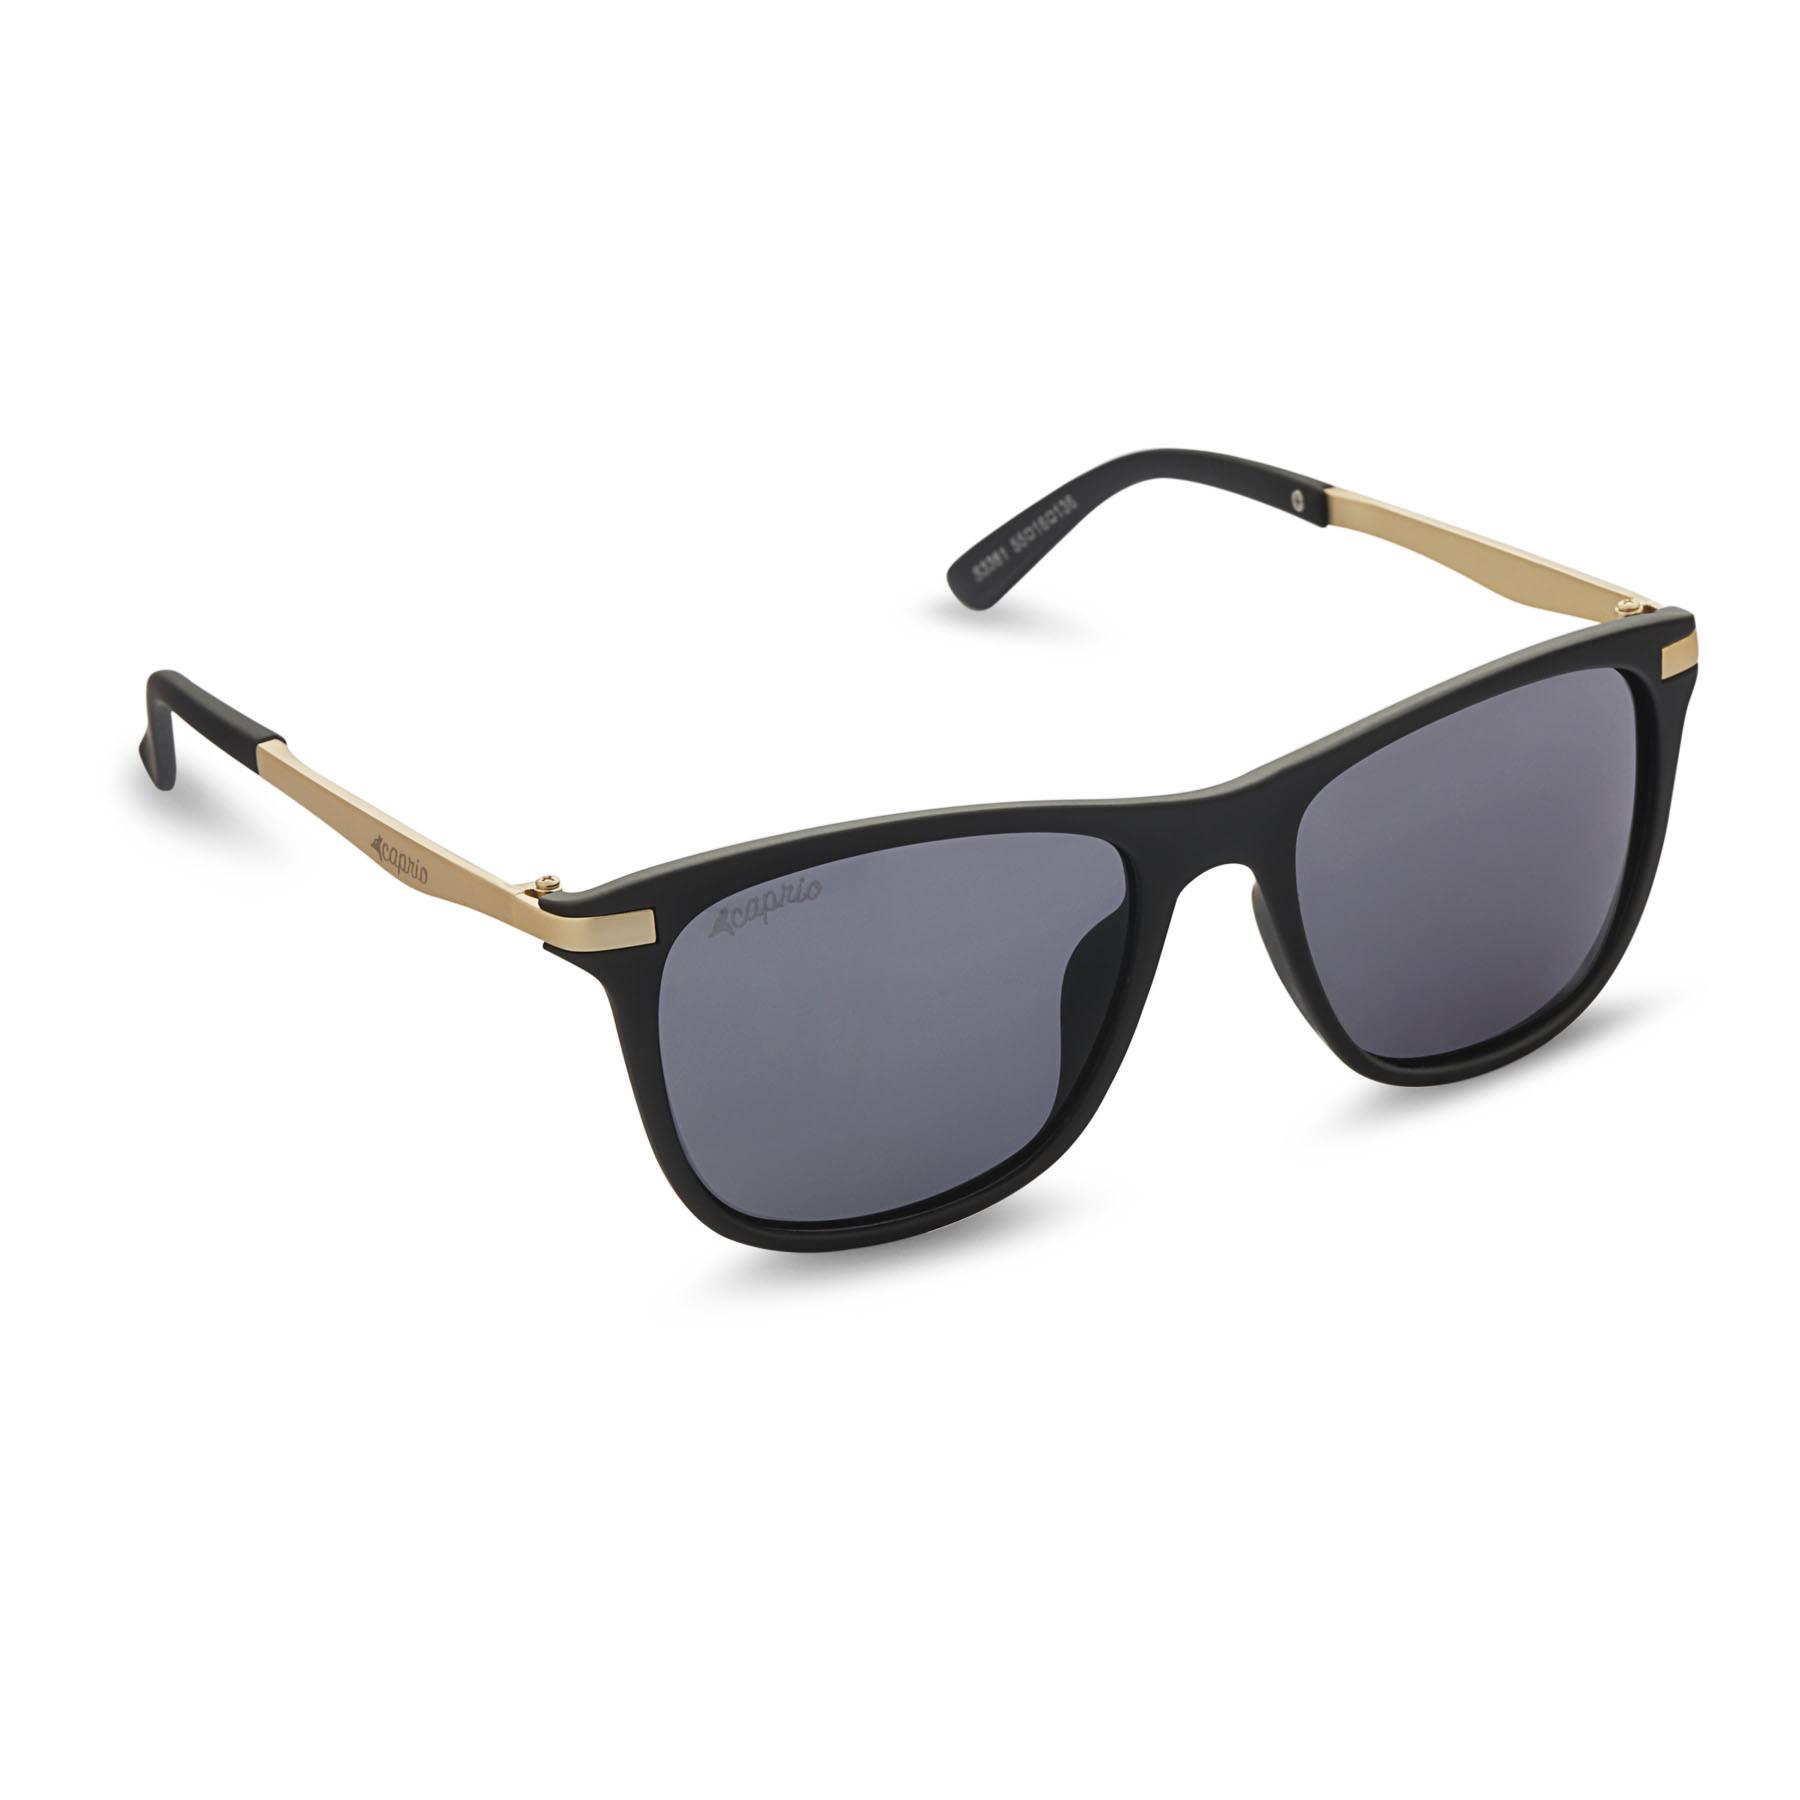 739253e303a Caprio Unisex Retro Square Sunglasses